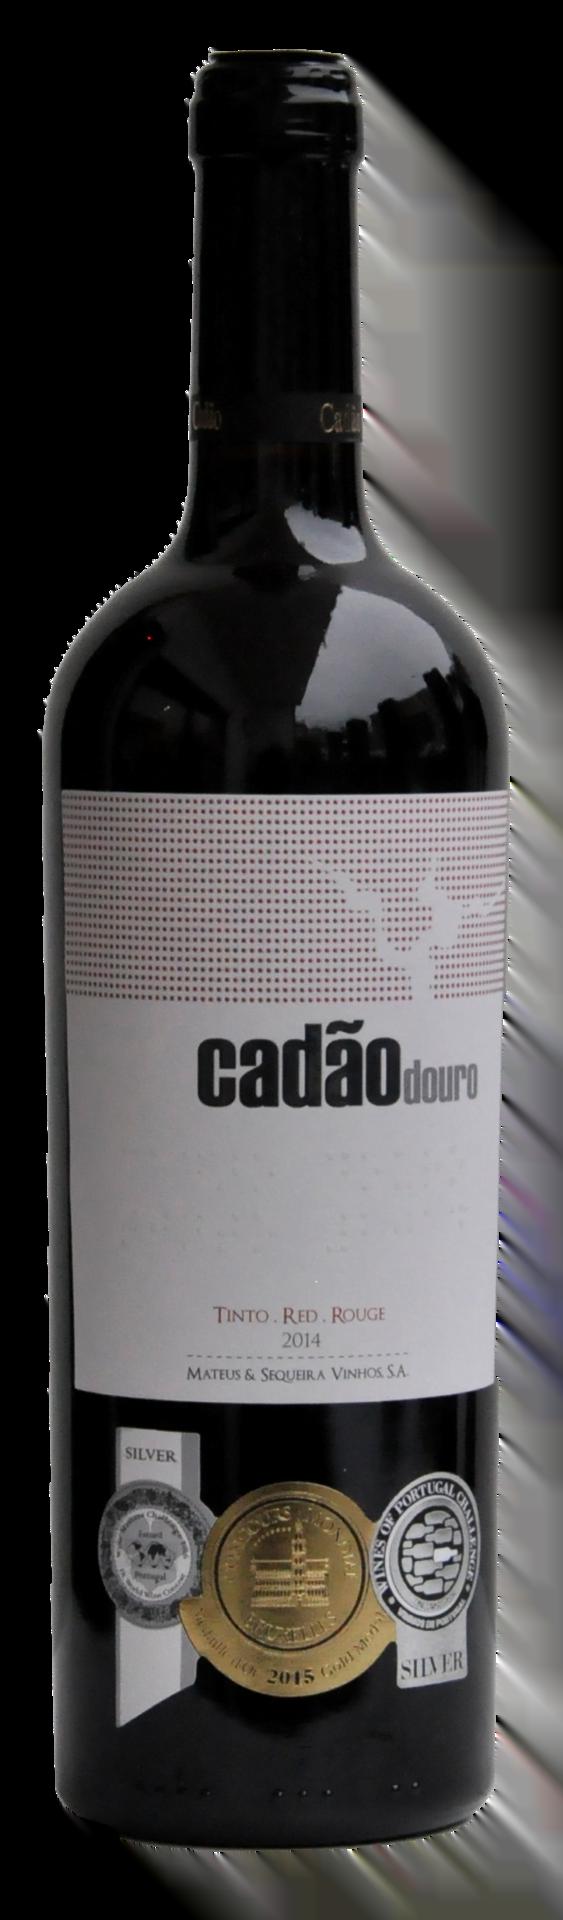 Cadão Rood   Portugal   gemaakt van de druif: Tinta Roriz, Touriga Franca, Touriga Nacional